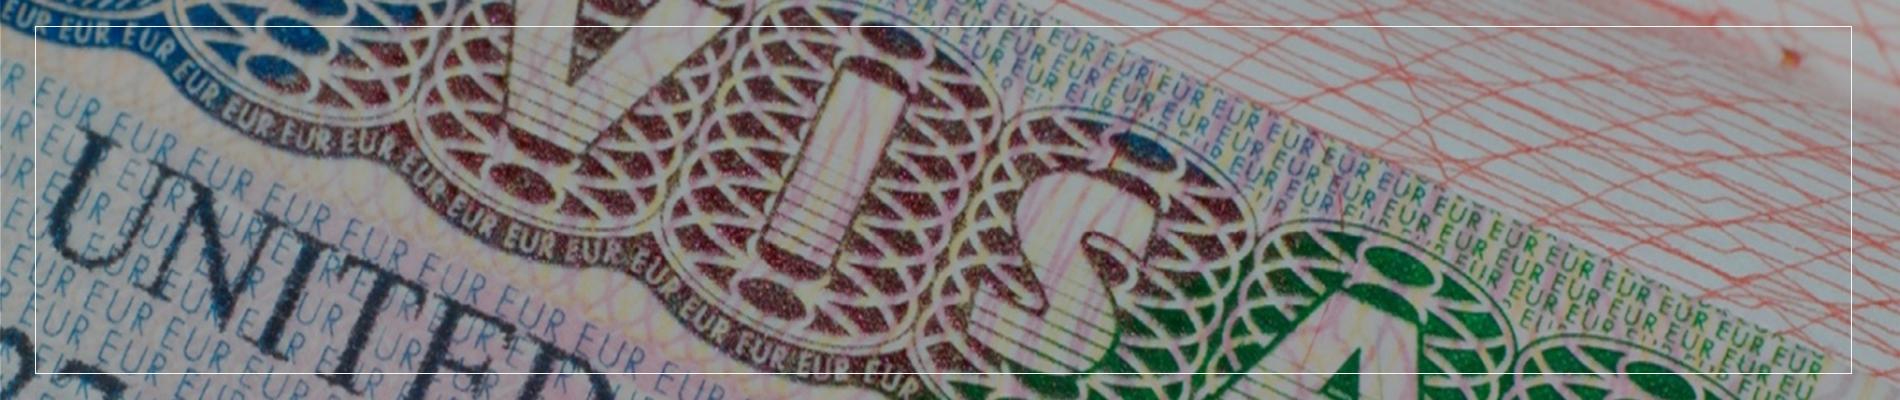 Turkish Passport Visa Free Countries